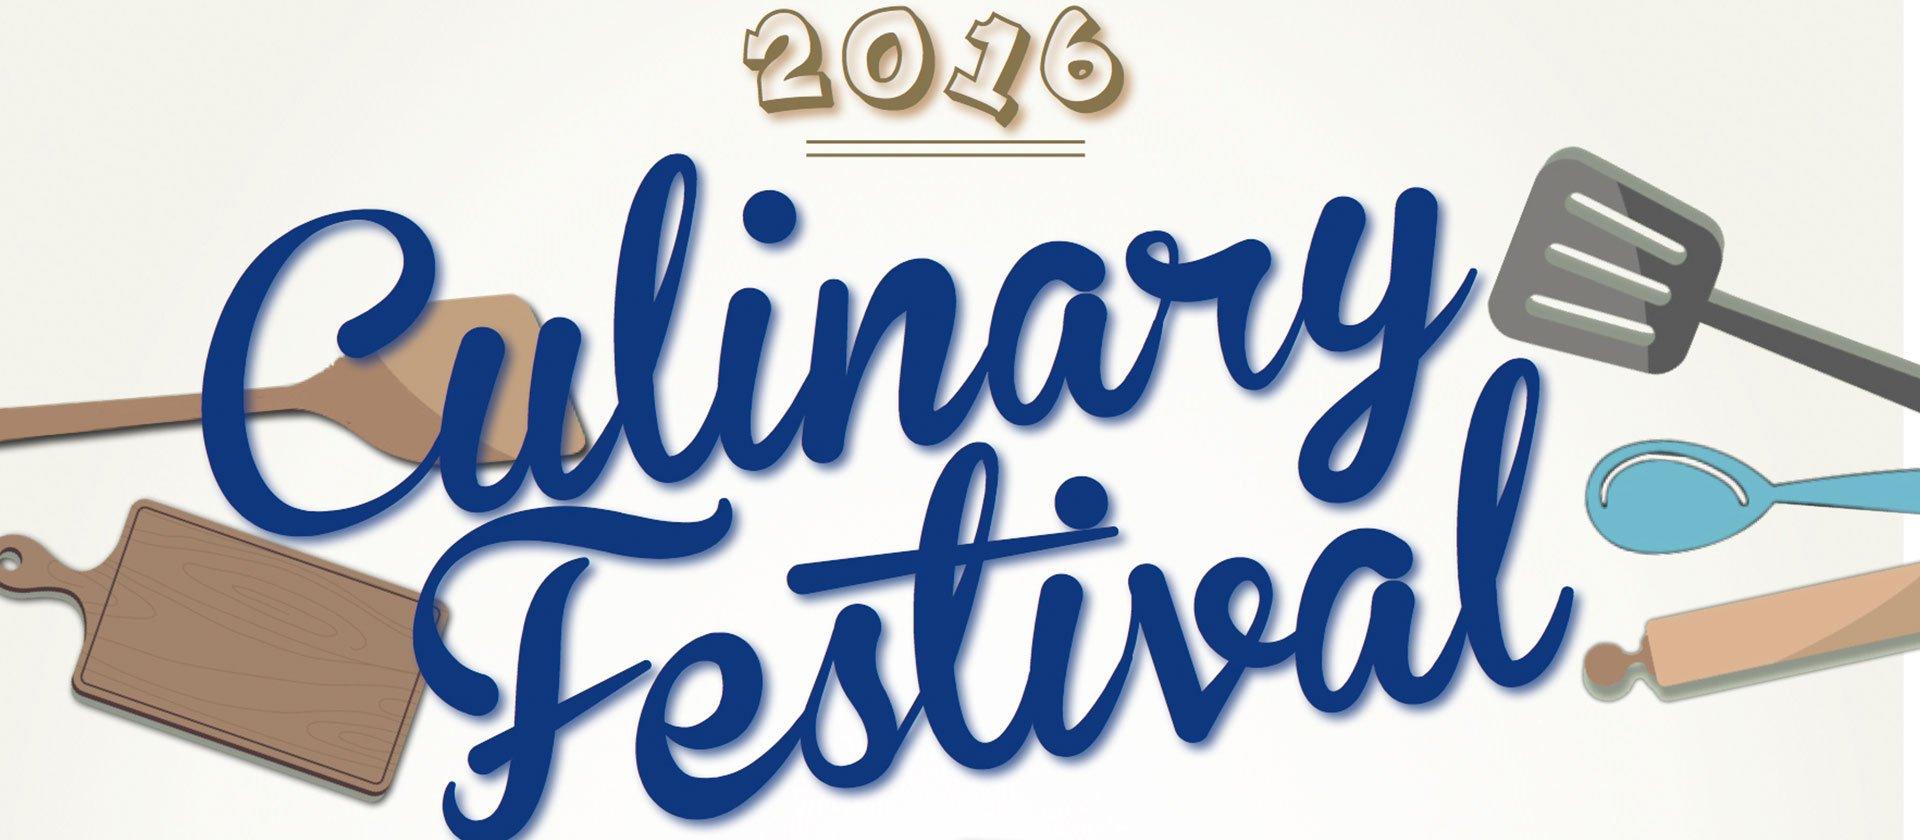 Le Cordon Bleu Culinary Festival